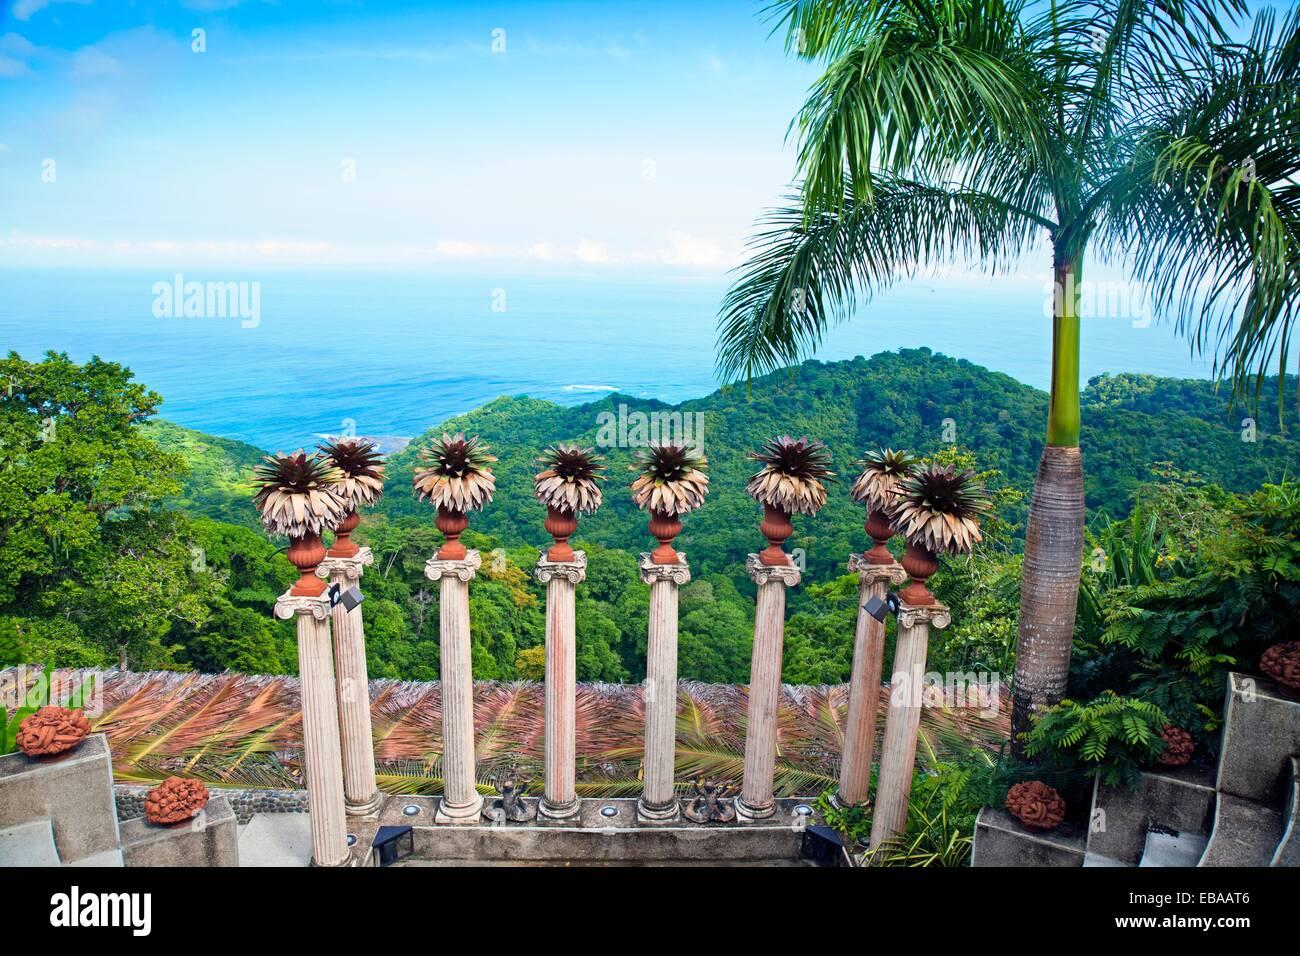 Hotel villa caletas jaco beach costa rica stock photo for Jardin villa austral punta arenas